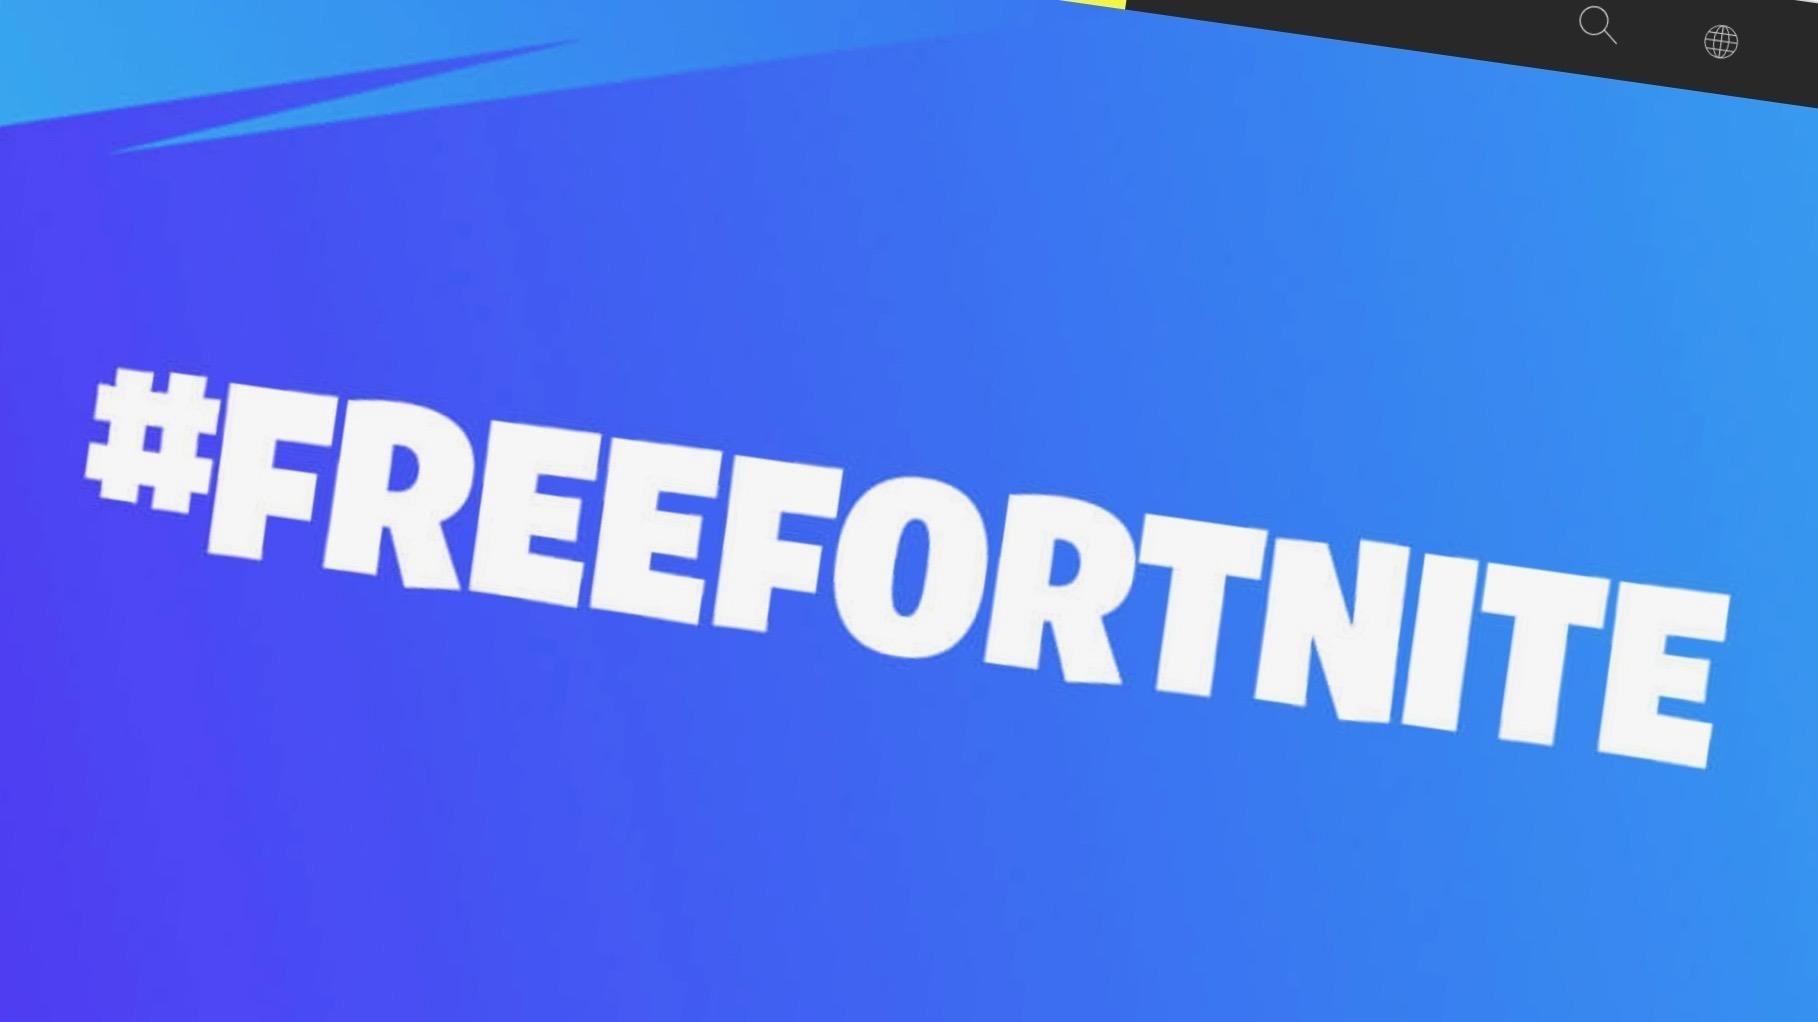 Epic Games Free Fortnite